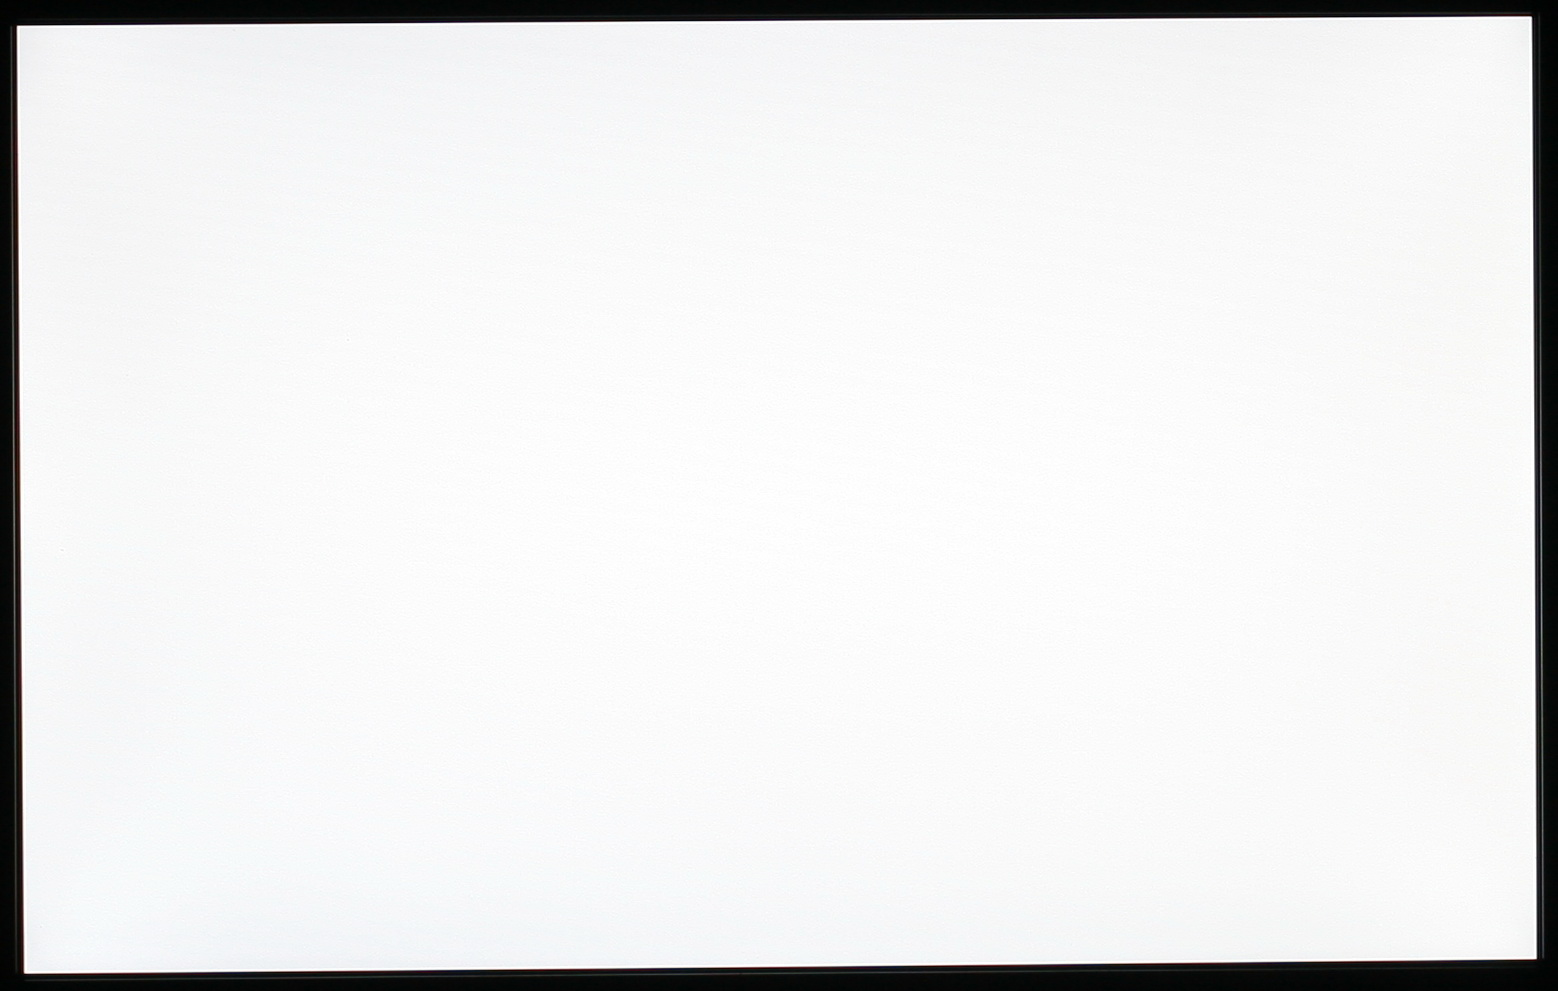 ppt 背景 背景图片 边框 模板 设计 相框 1558_991